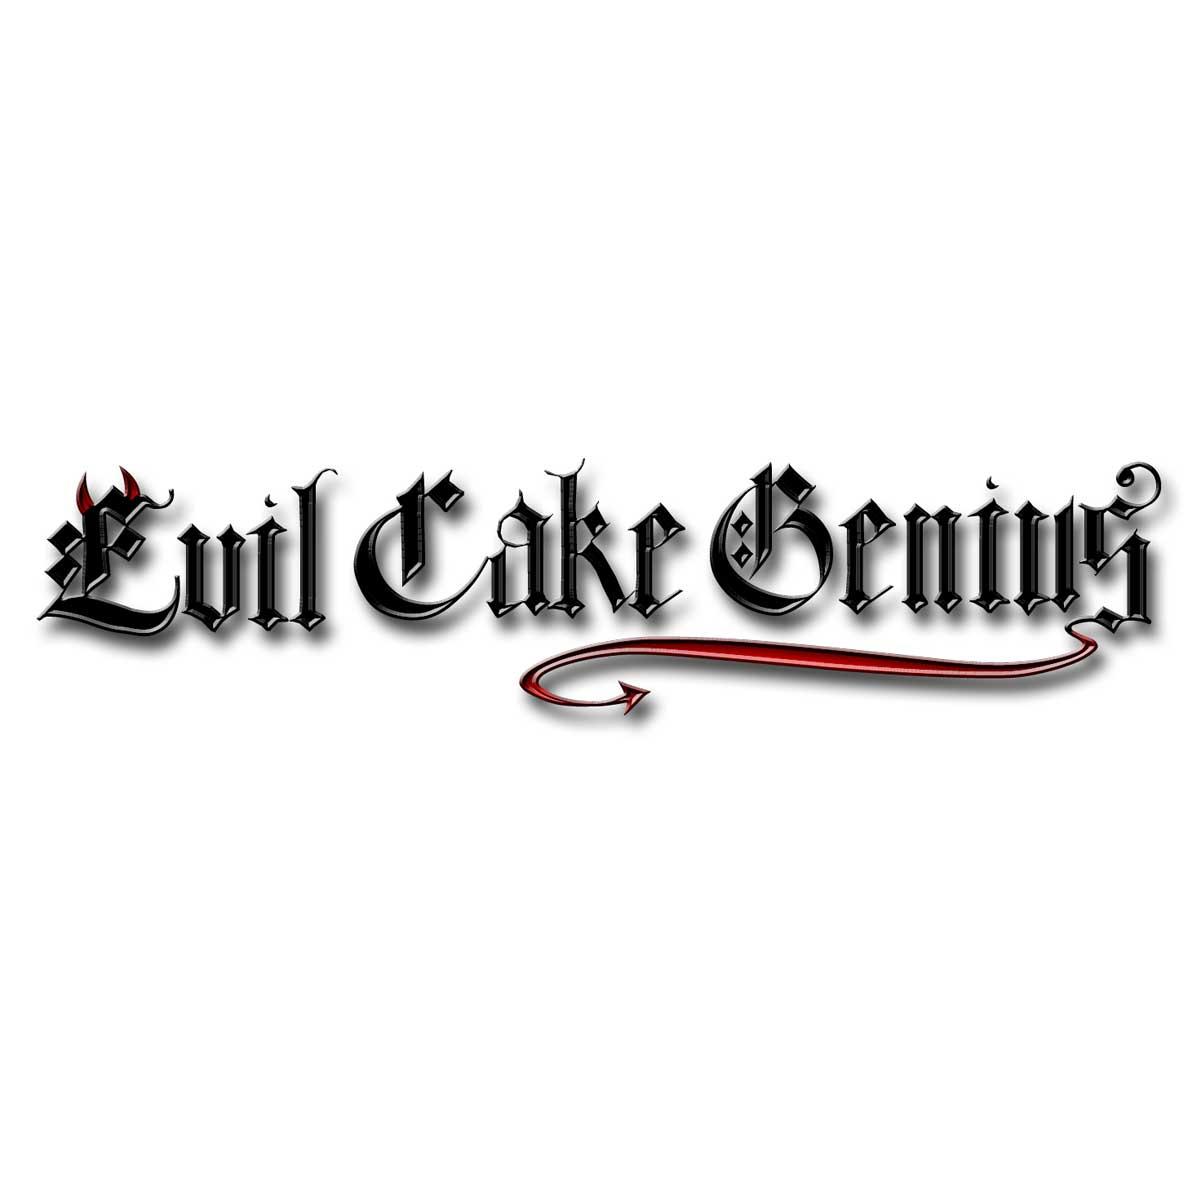 Cake Pan Wraps - Small